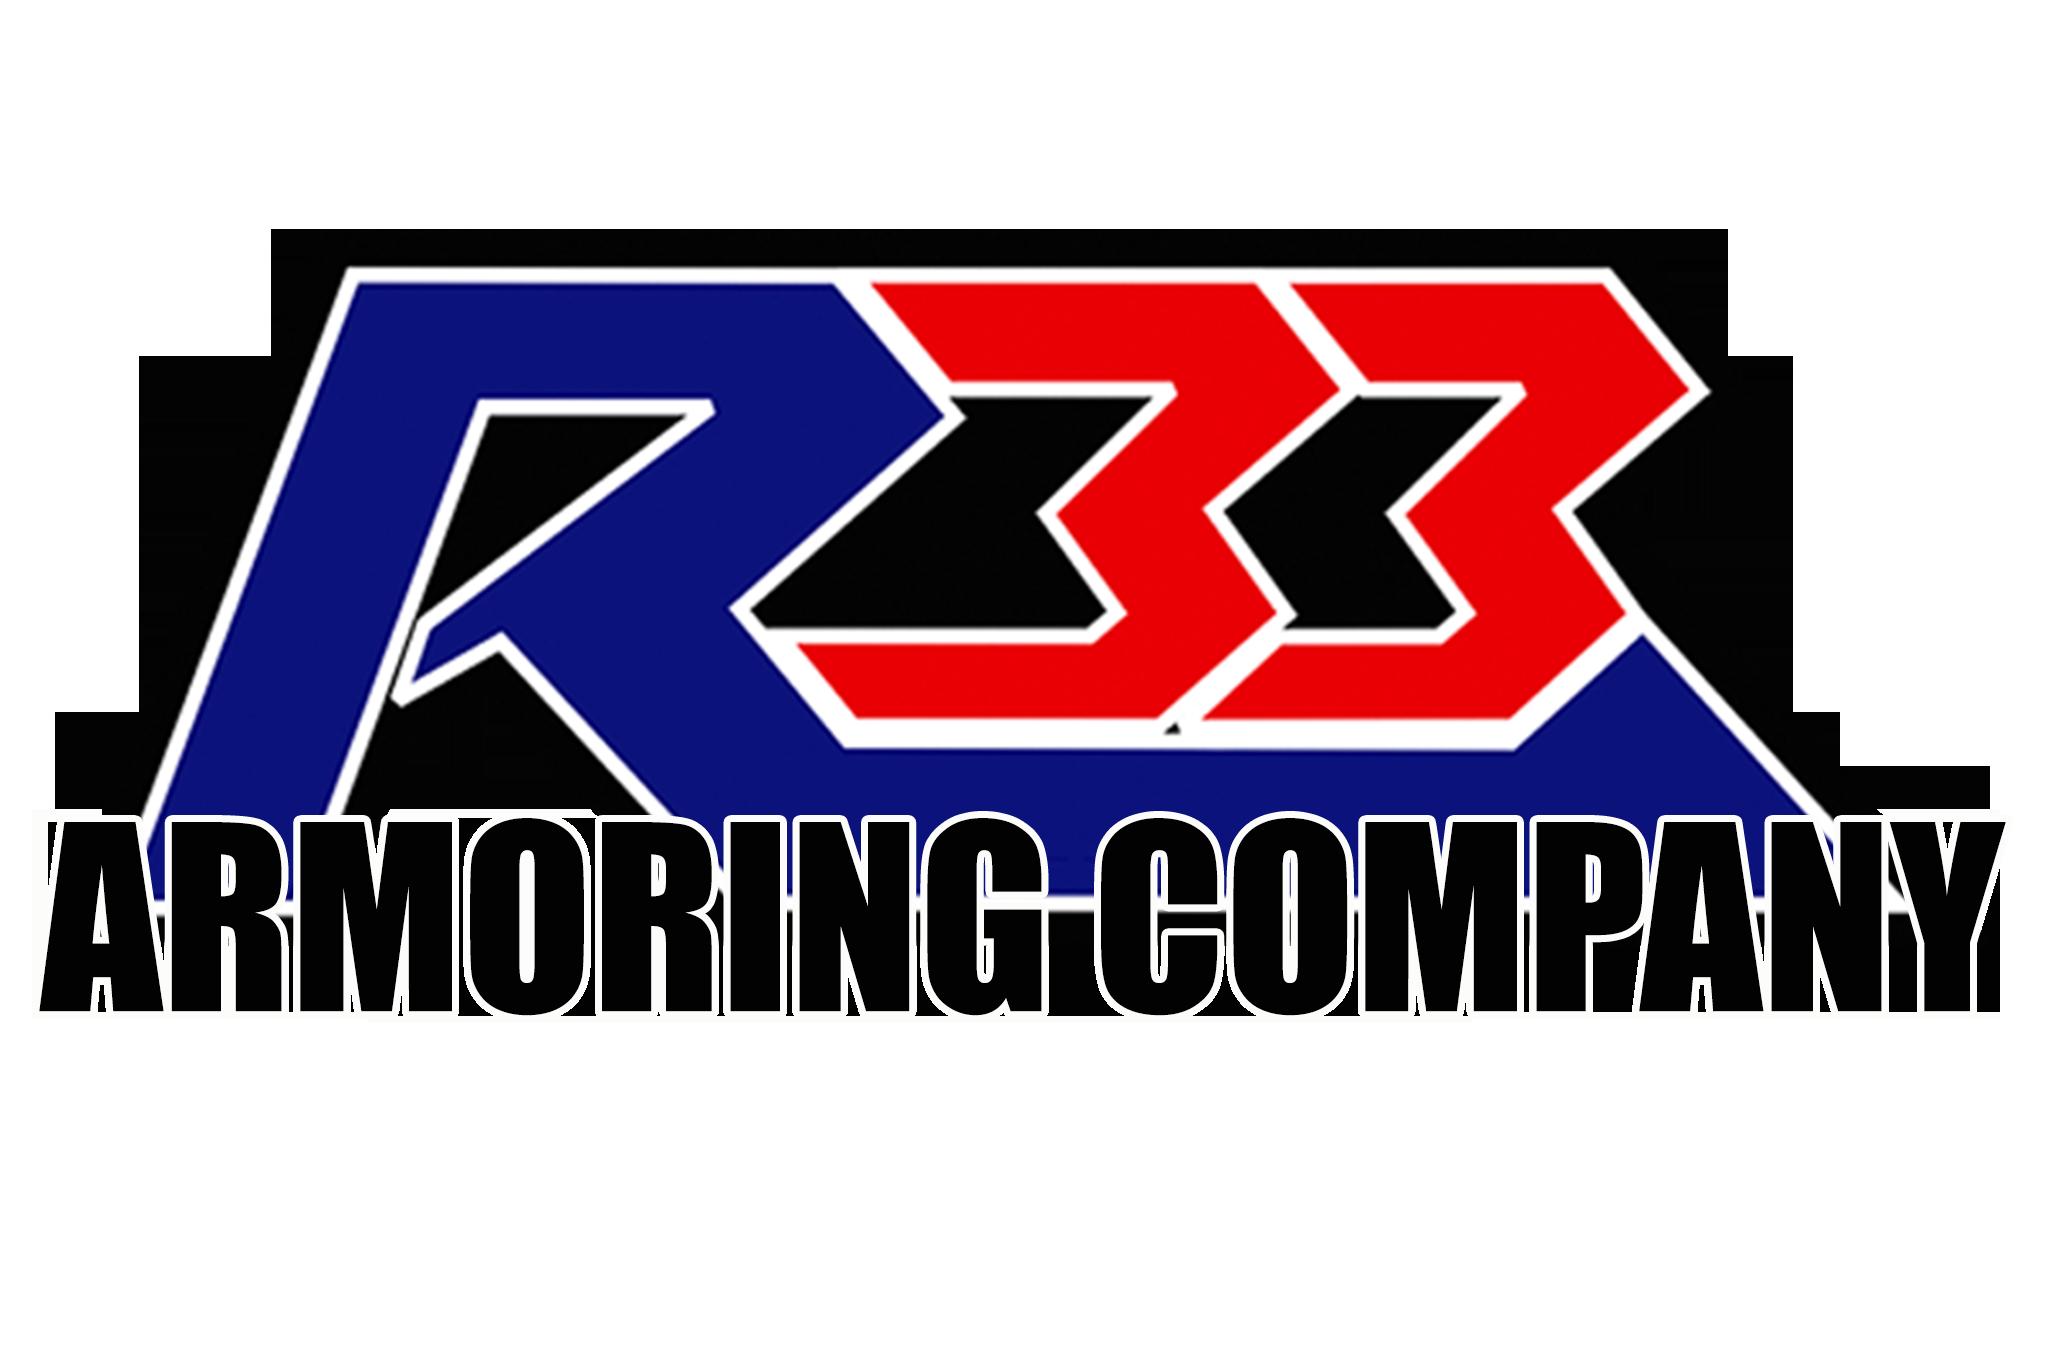 R33ArmoringCorporation2.png